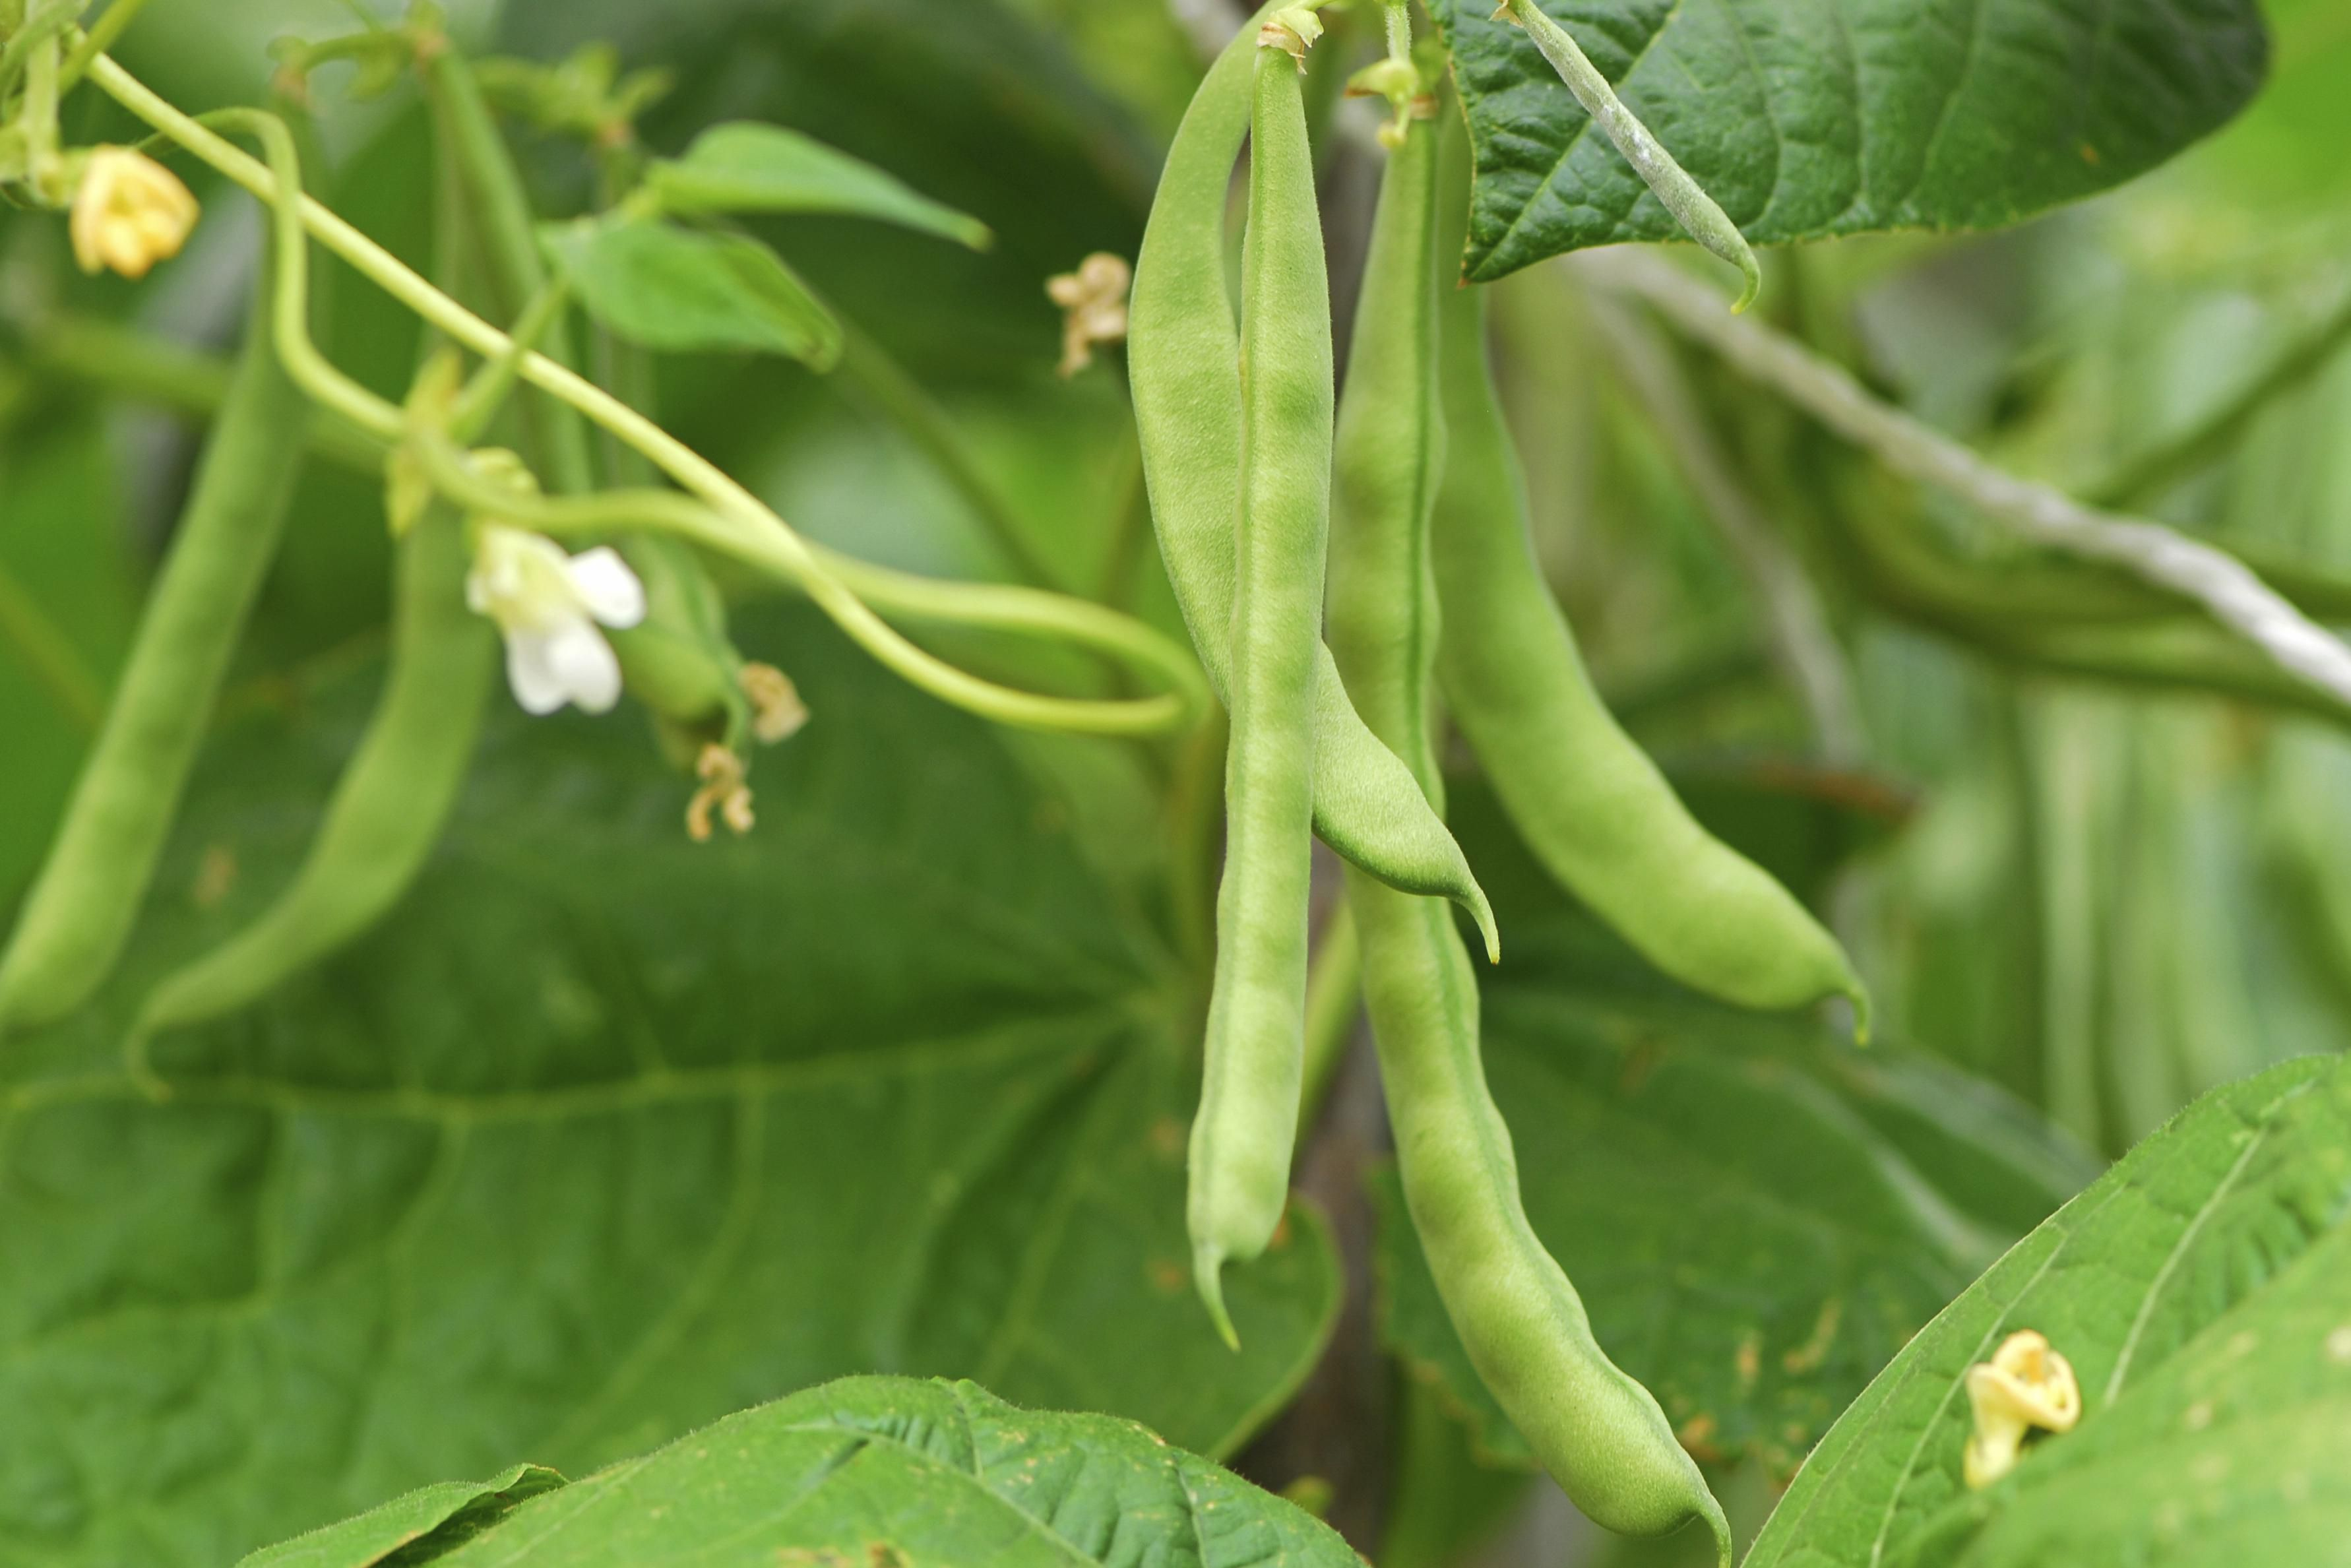 The Best Companion Plants For Pole Beans And Bush Beans